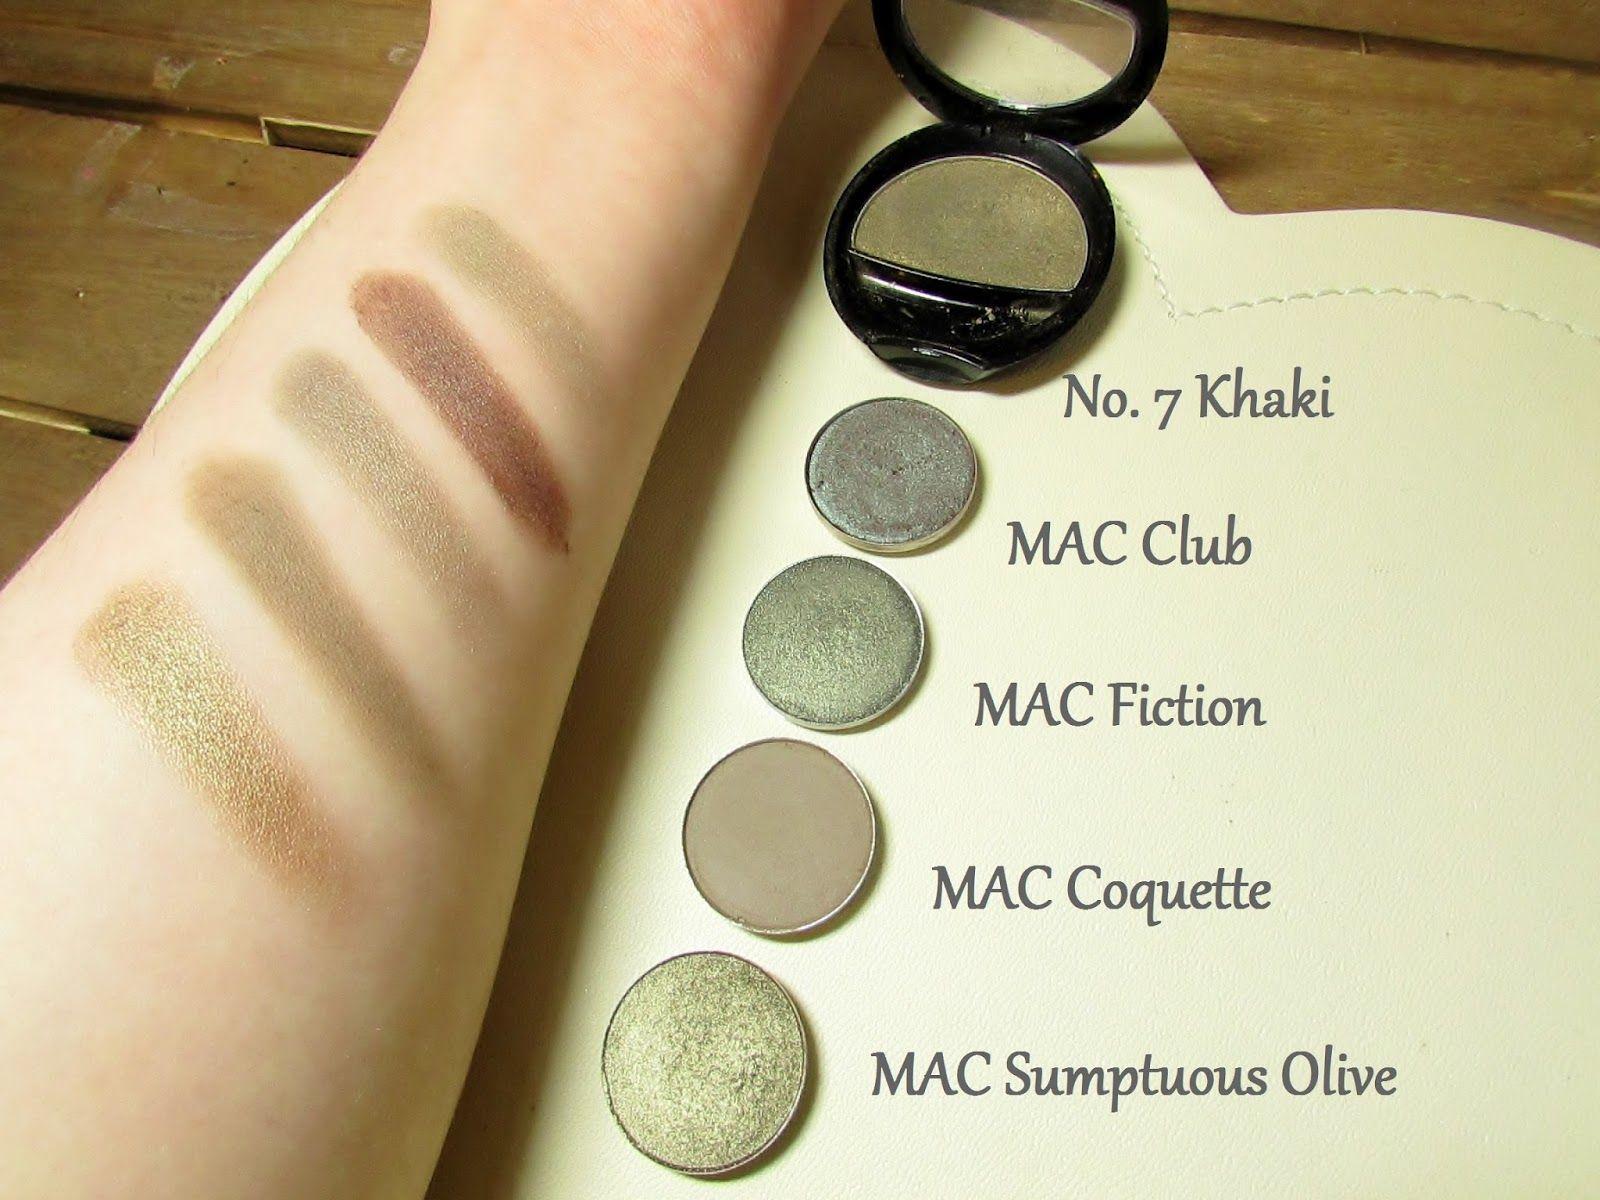 mac club mac sumptuous olive mac fiction mac coquette